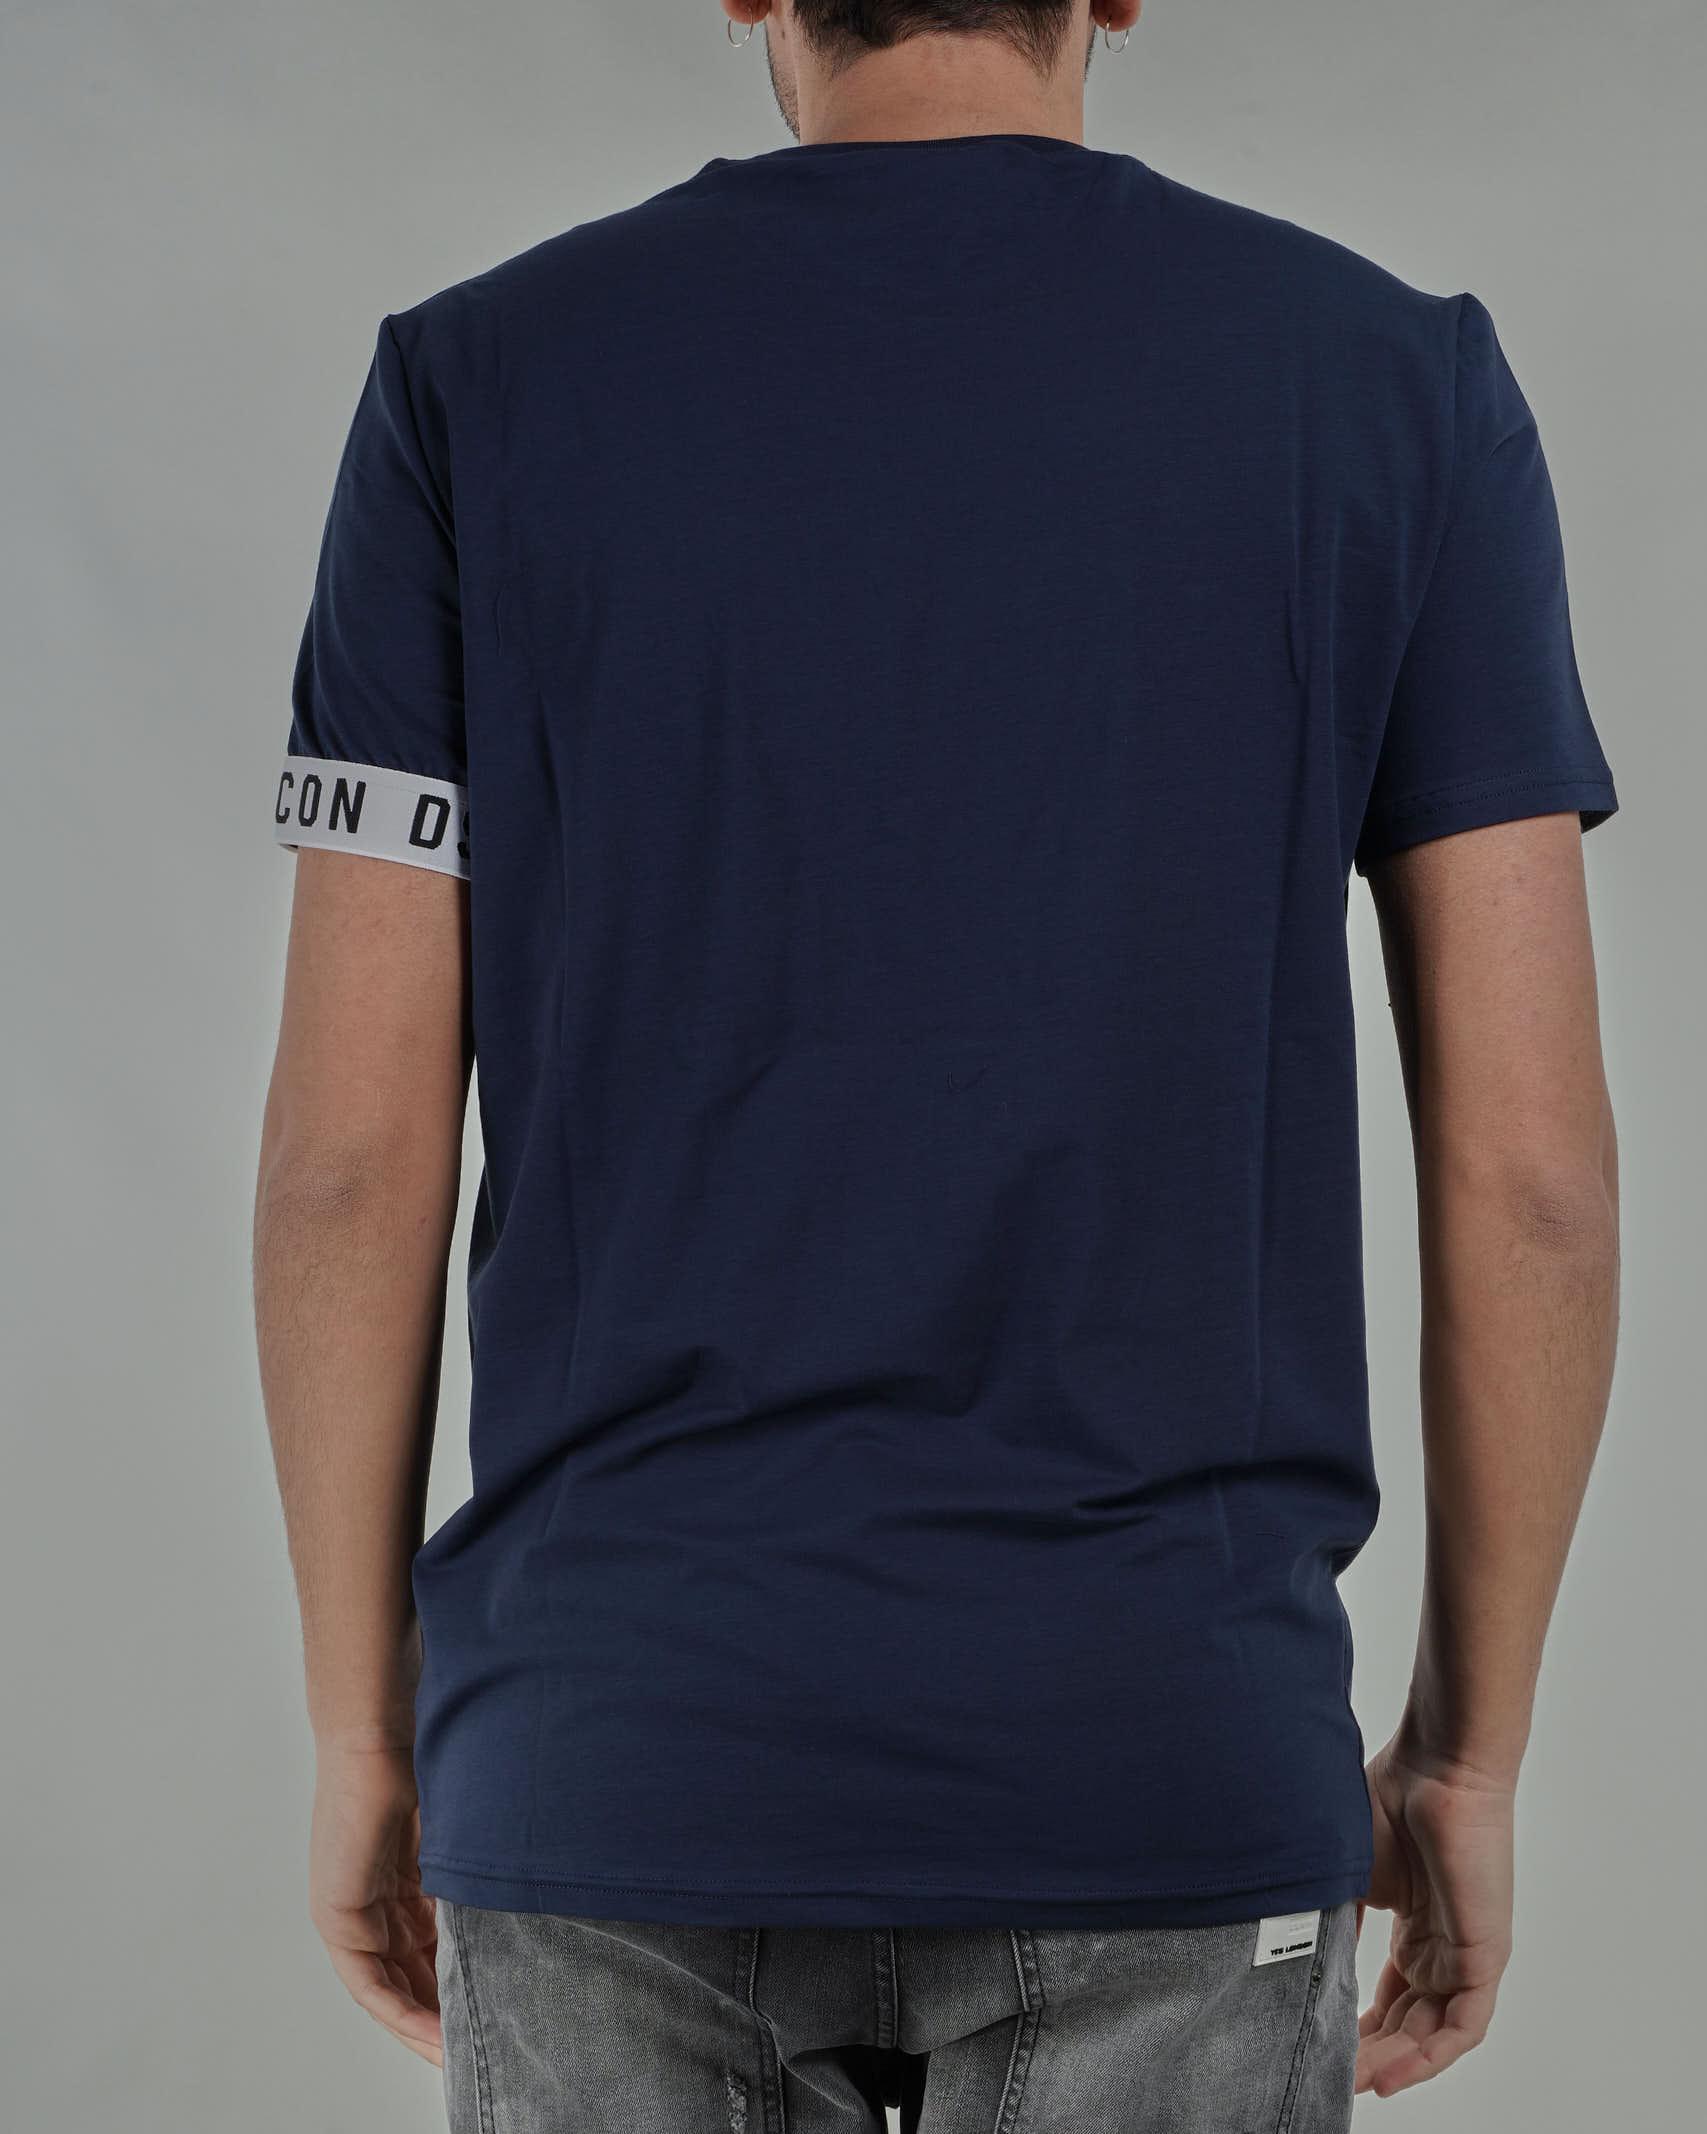 T-shirt con logo sulla manica DSQ2 Dsquared DSQUARED | T-shirt | D9M3S3450402